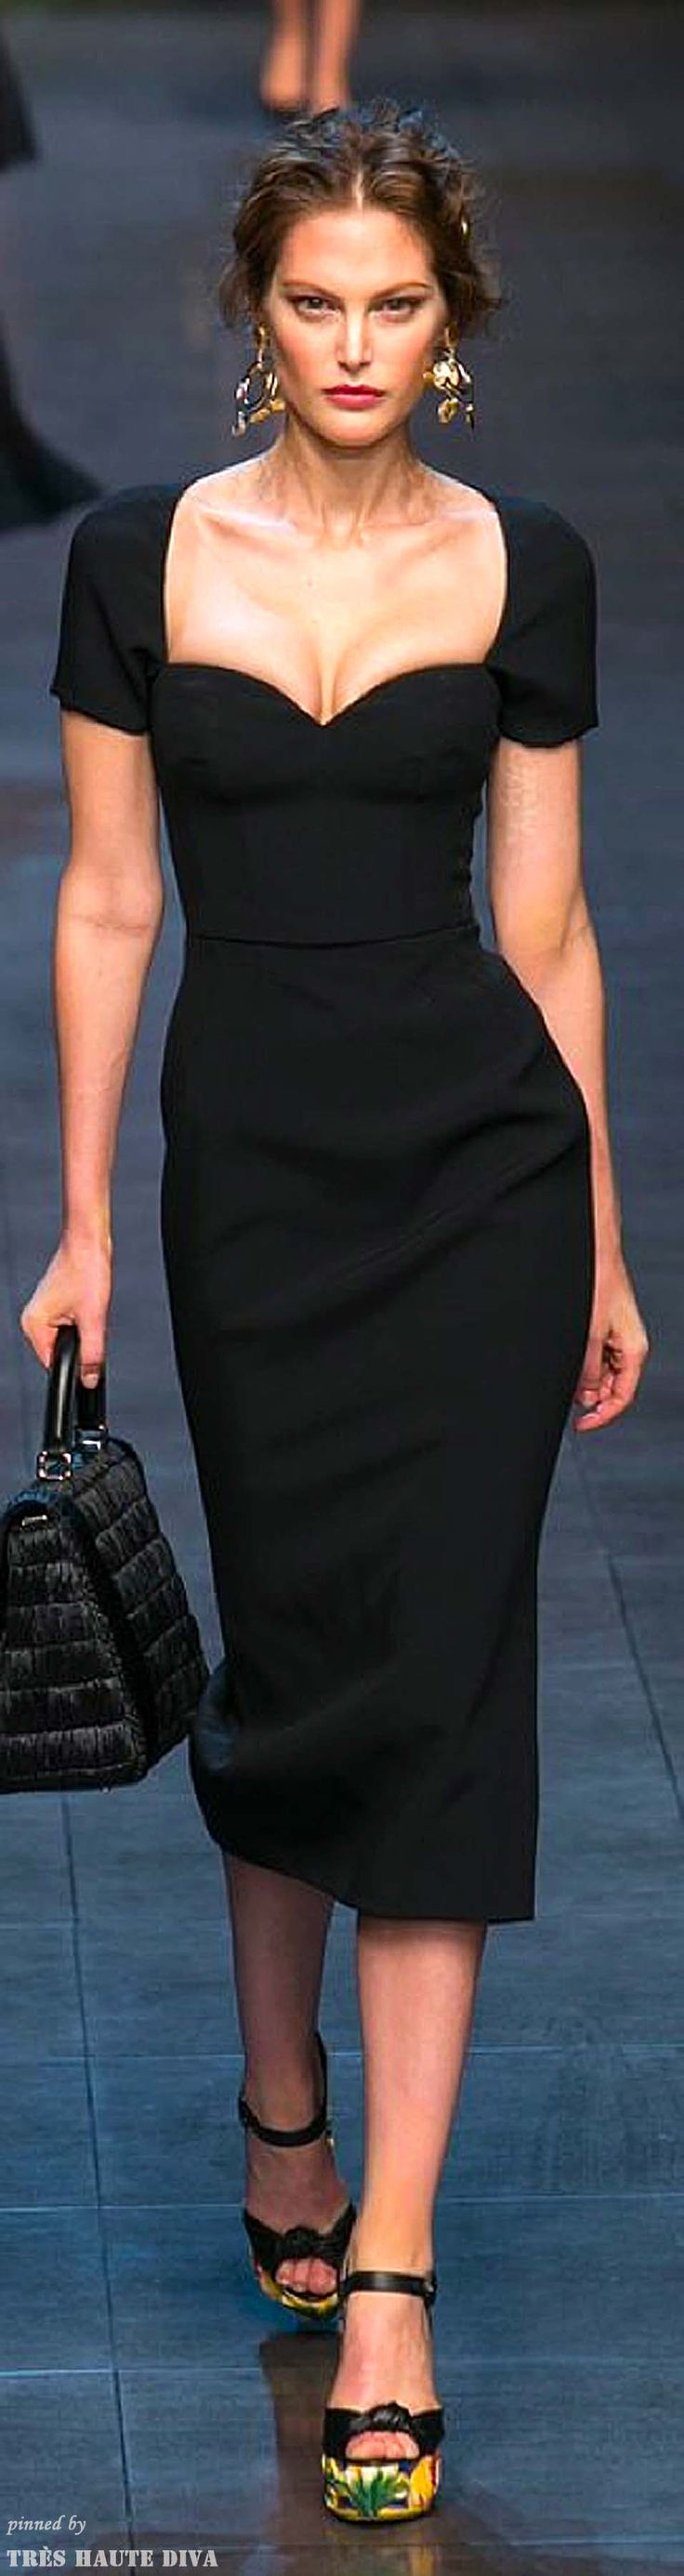 A long black dress quarter